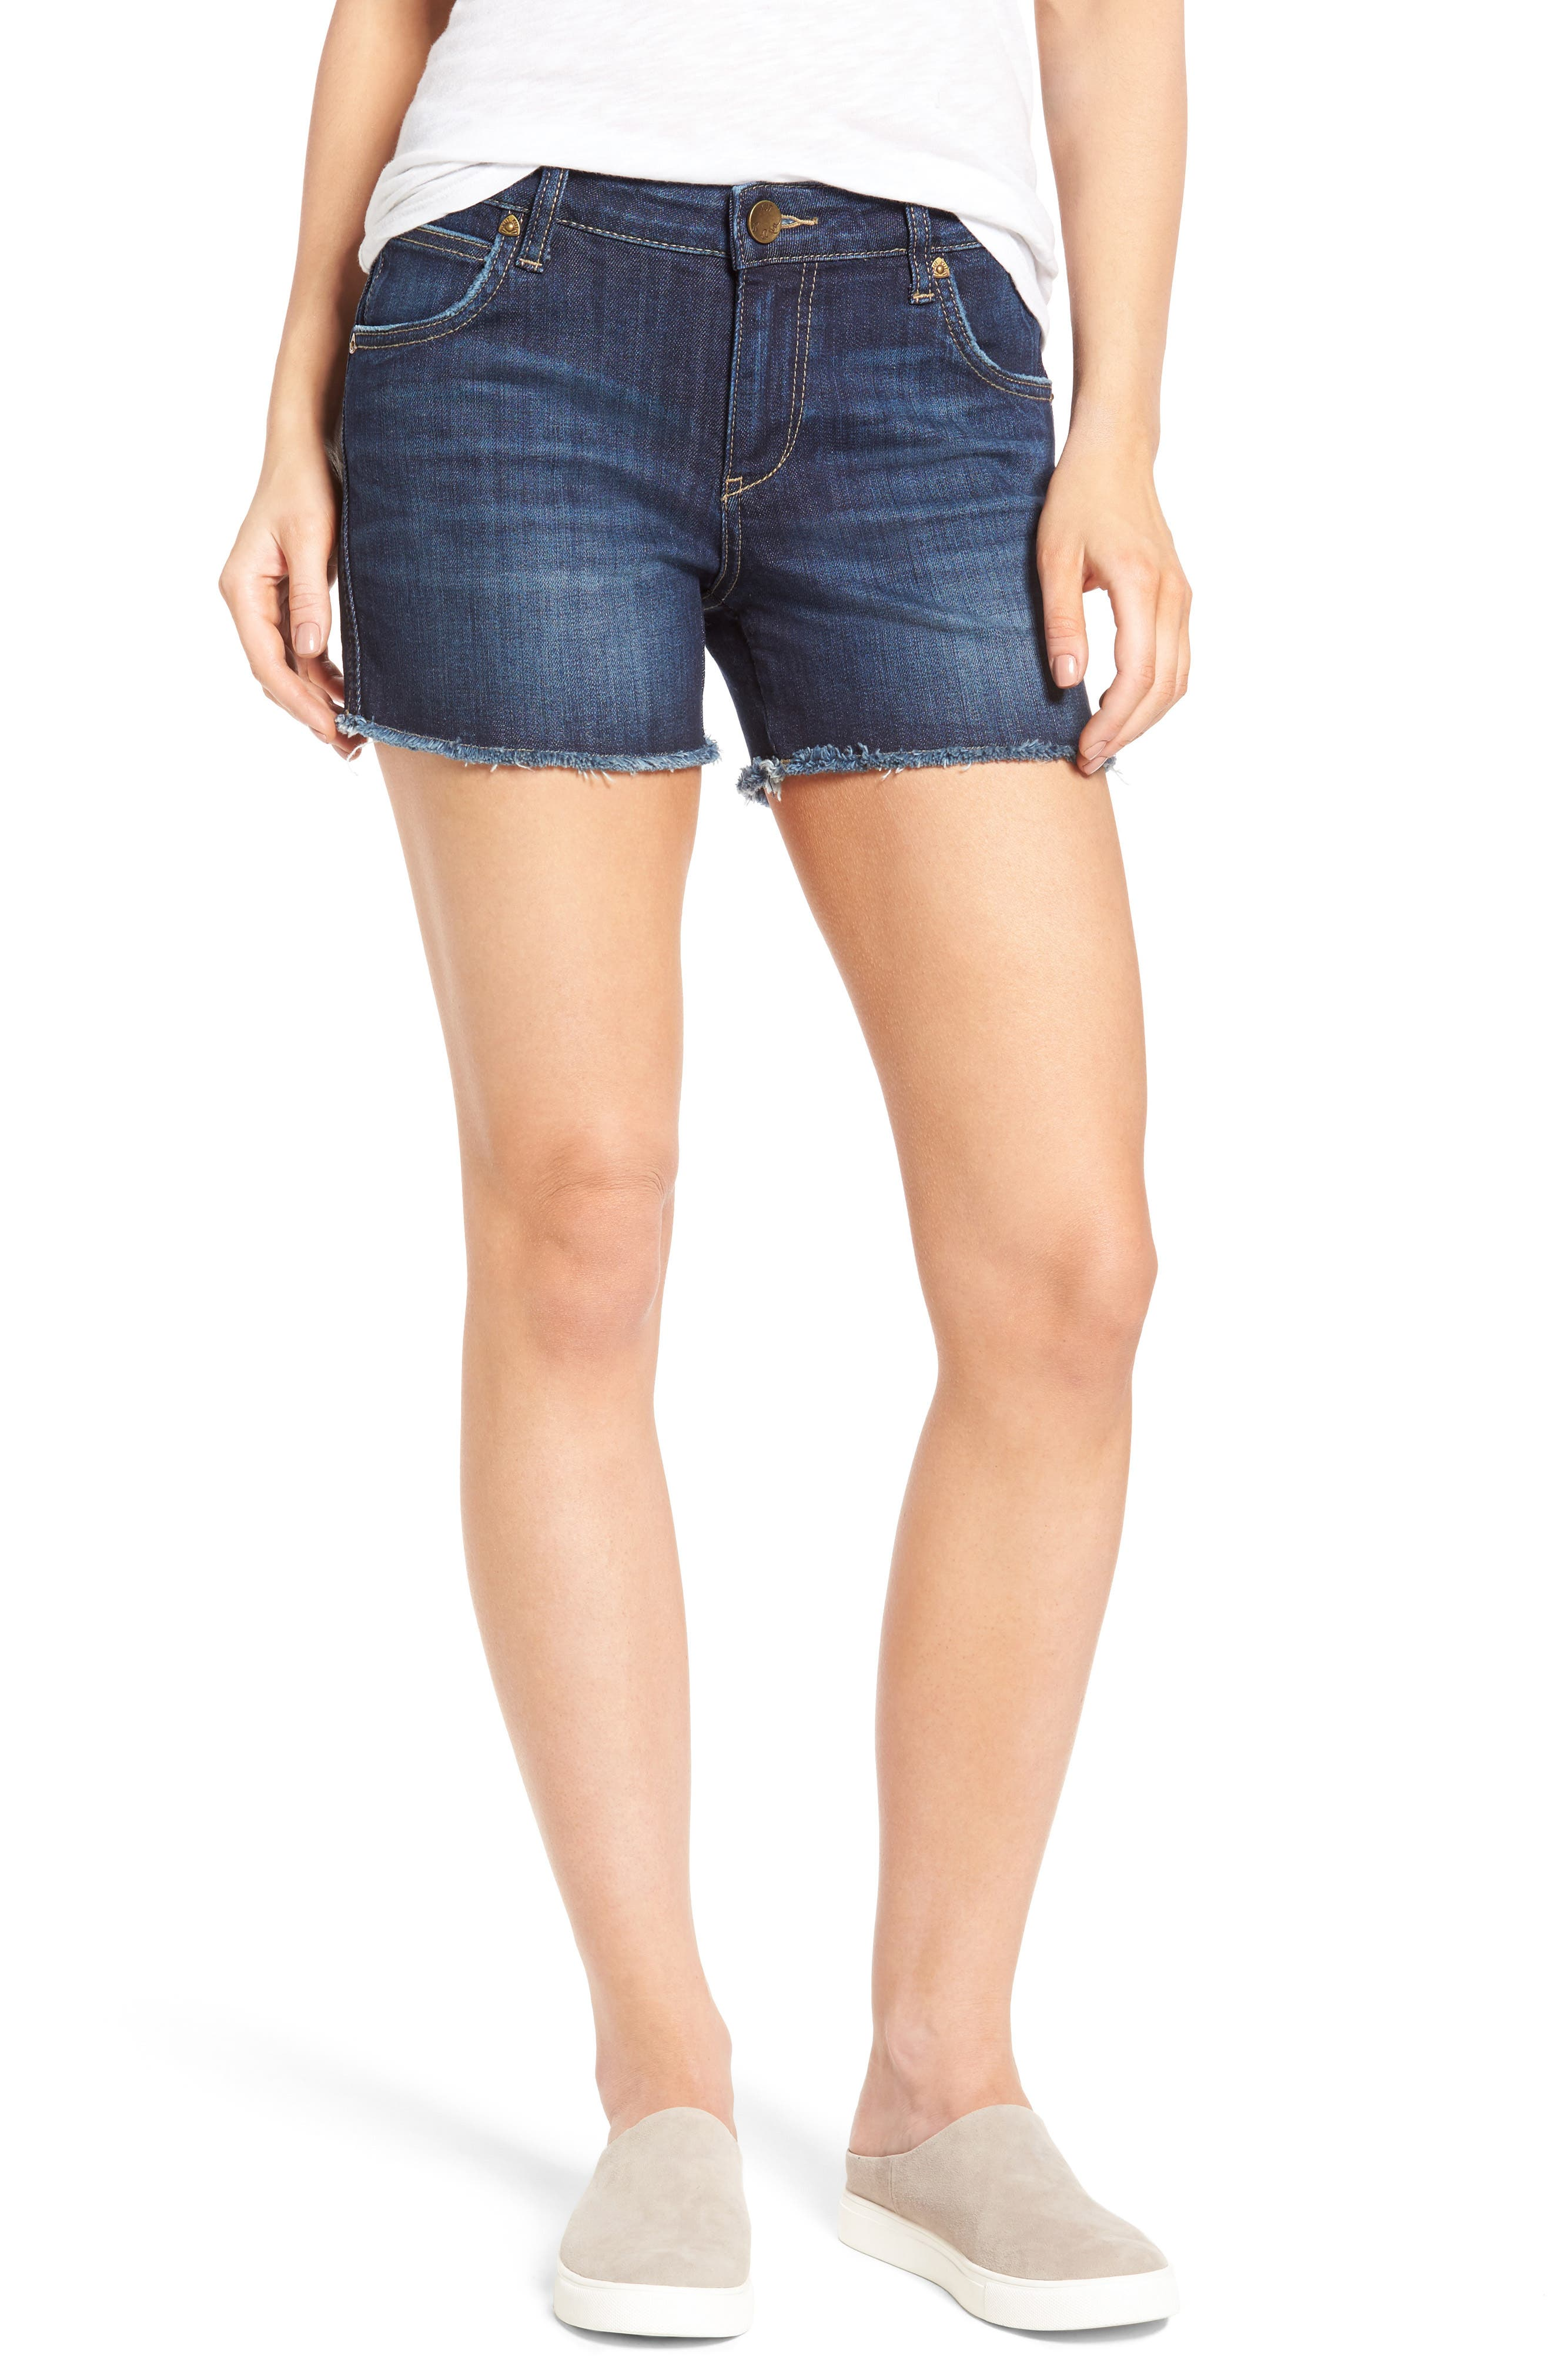 Gidget Denim Cutoff Shorts,                         Main,                         color, STIMULATING